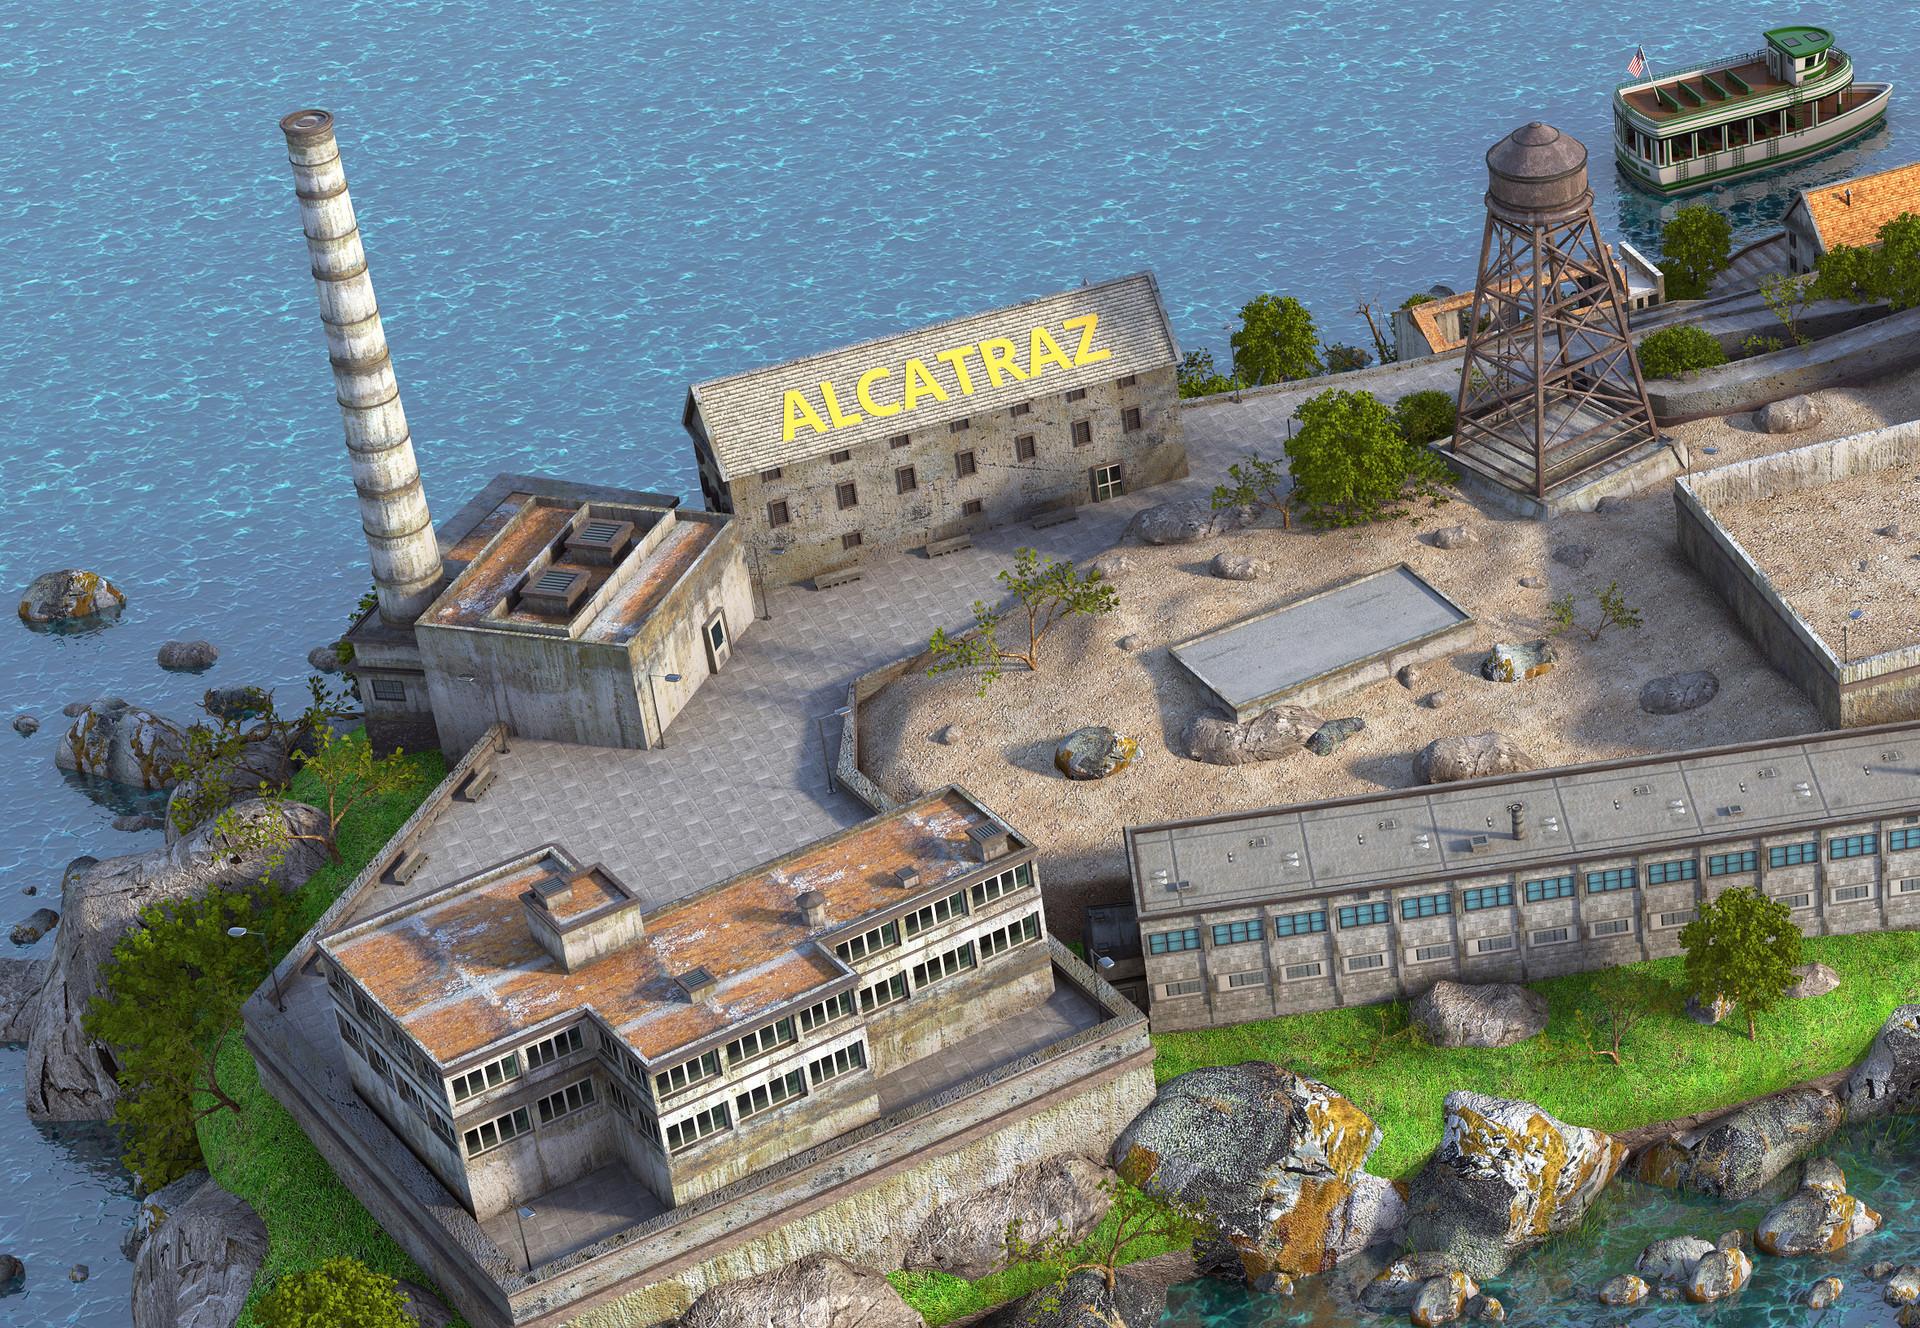 Marc mons alcatraz9